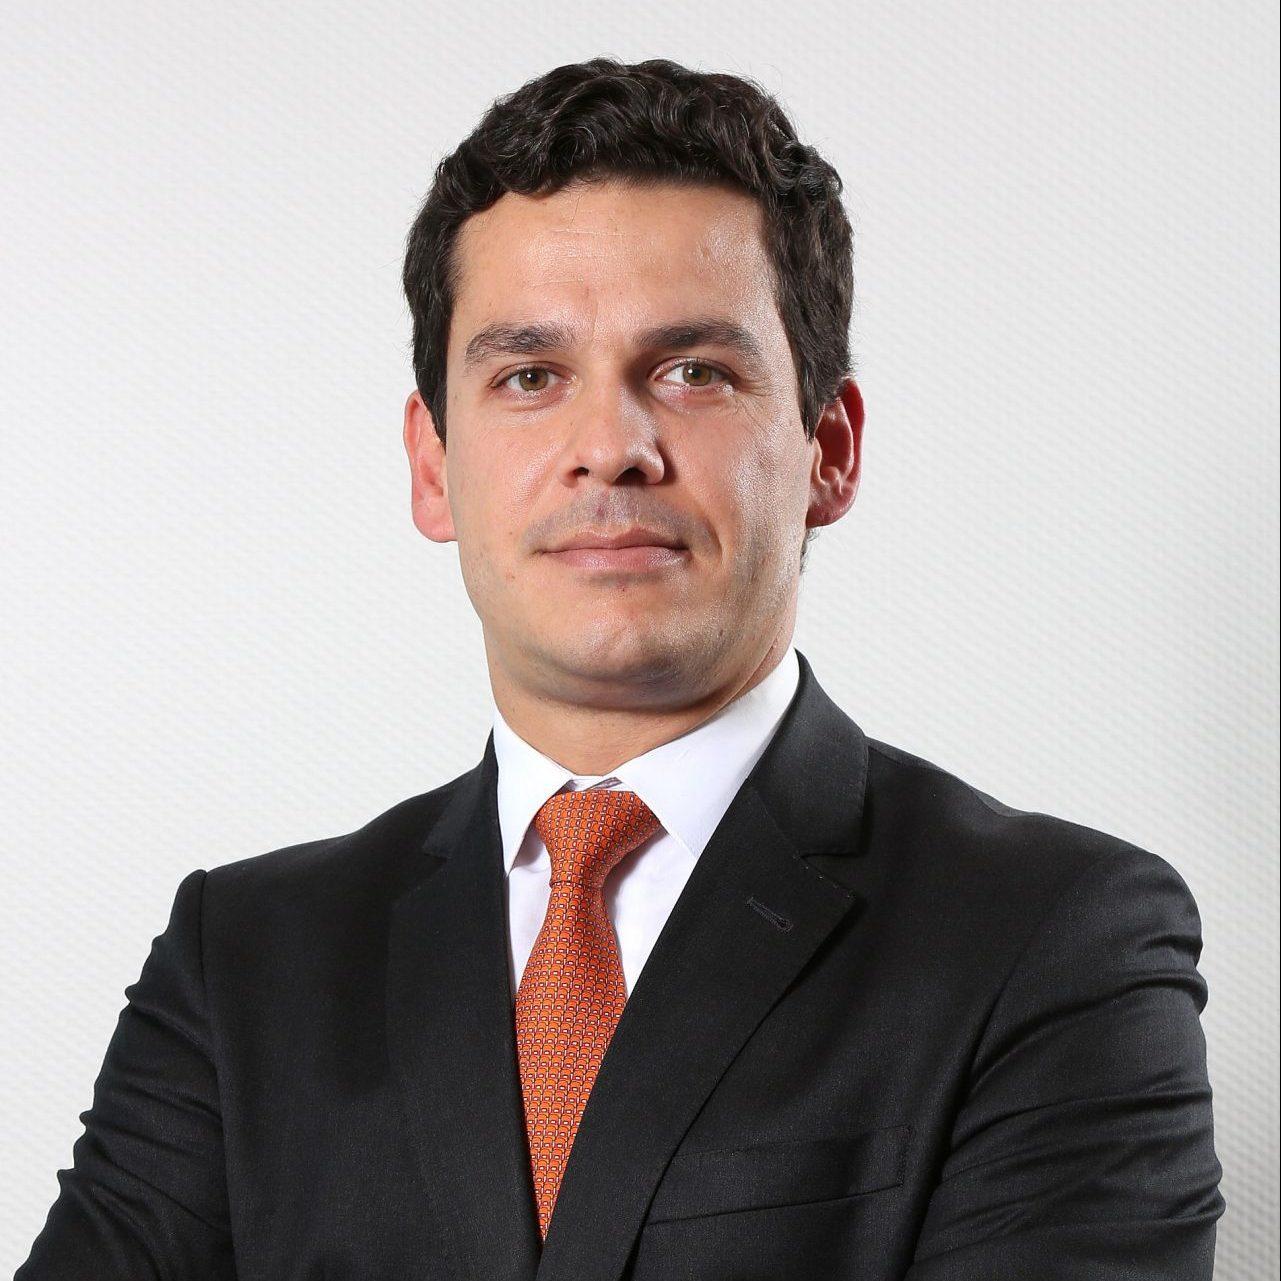 Luiz Henrique Carvalho